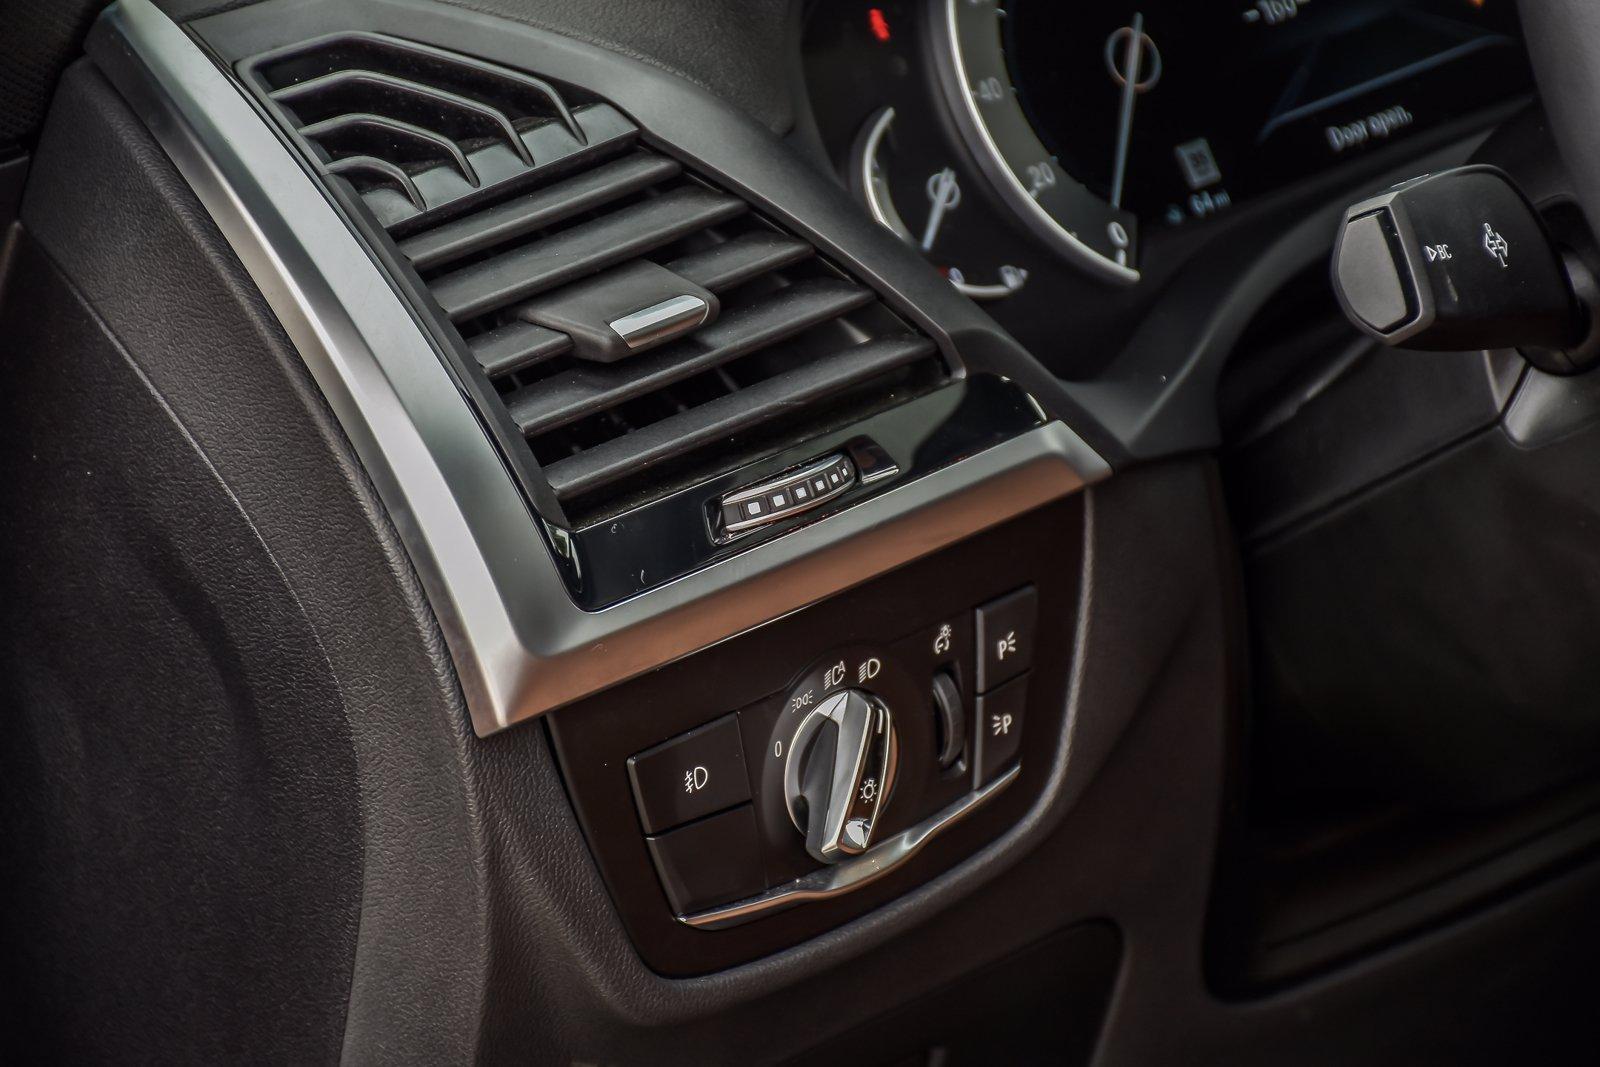 Used 2018 BMW X3 xDrive30i X-Line Premium With Navigation | Downers Grove, IL